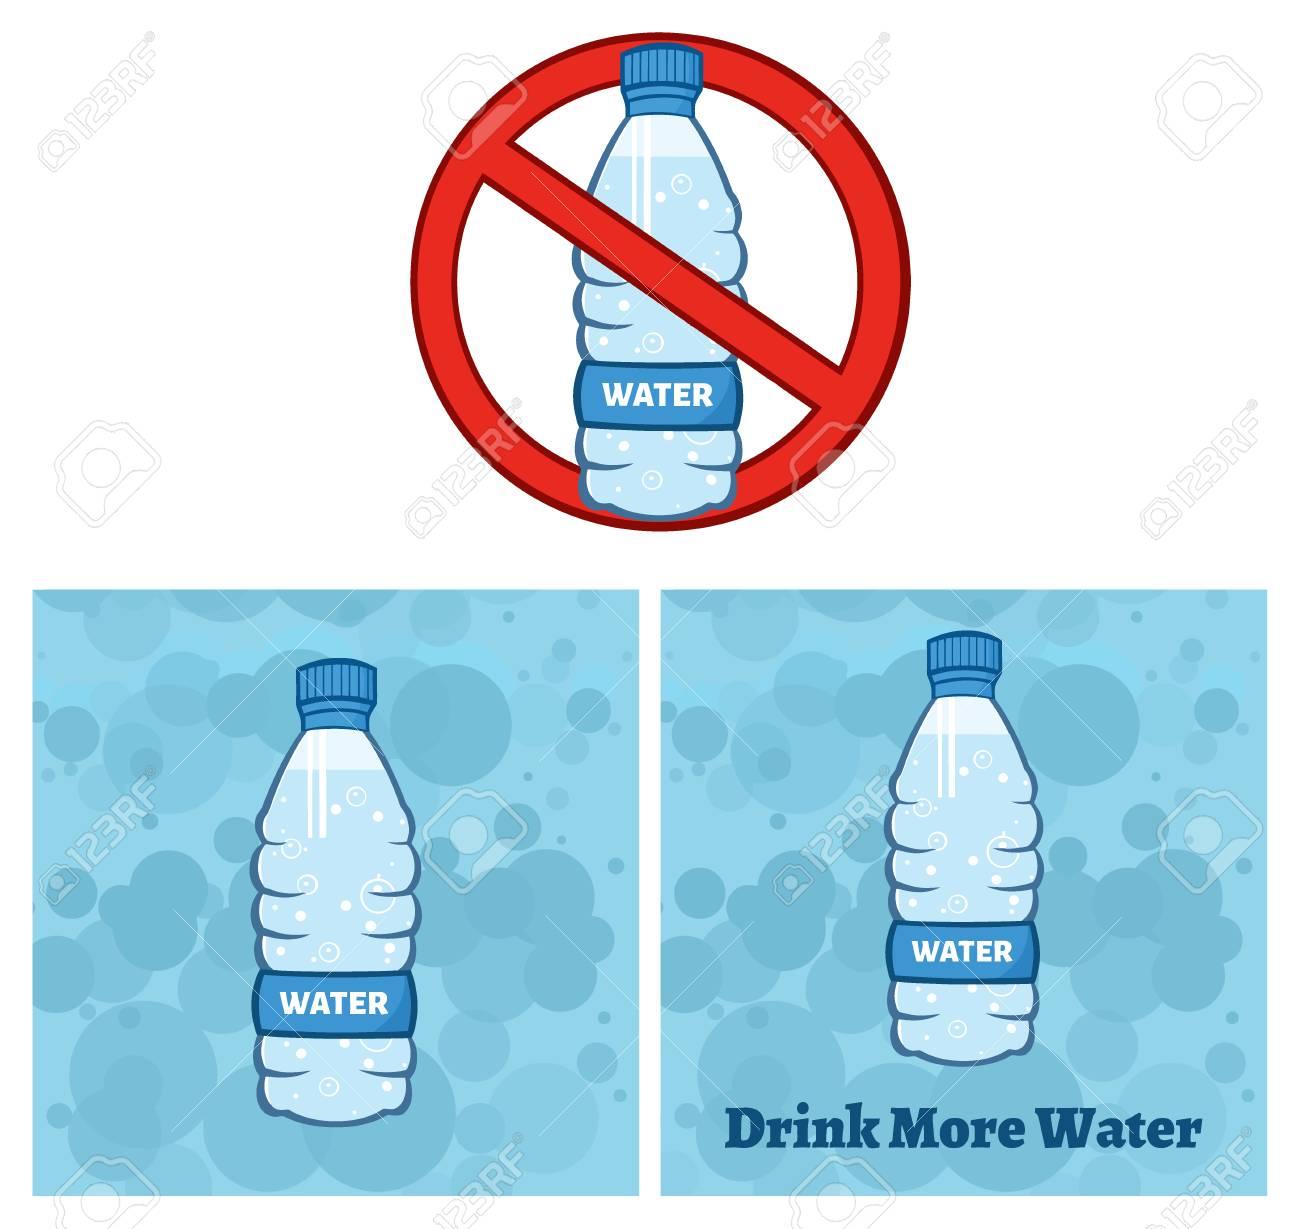 Restricted Symbol Over A Water Plastic Bottle Cartoon Illustration